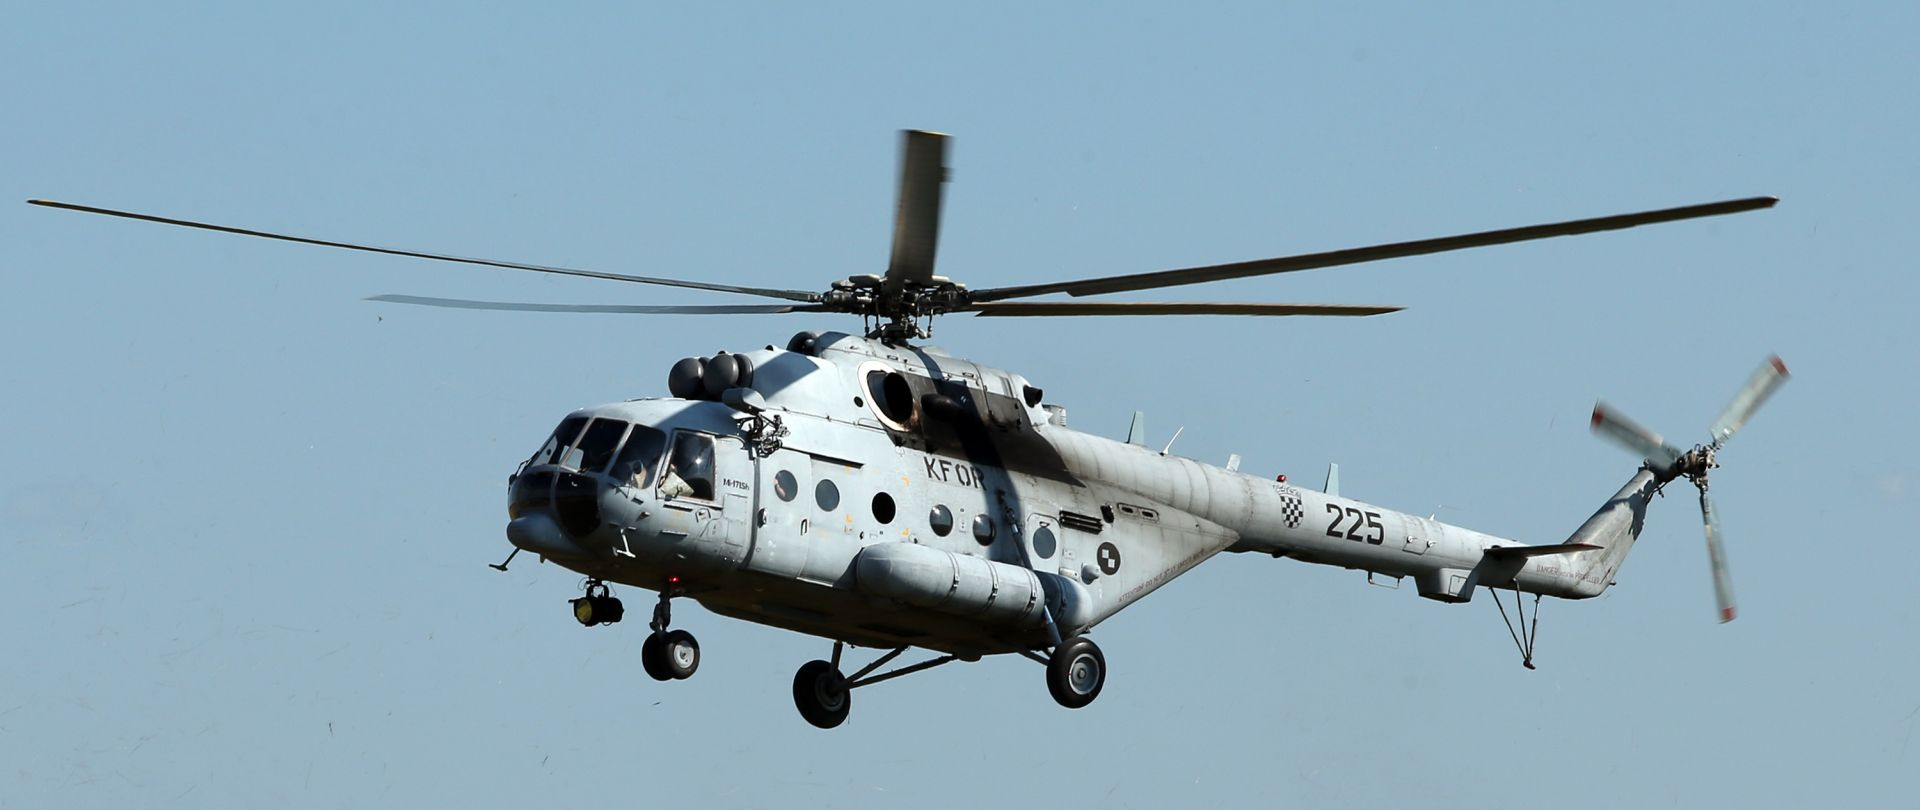 HEROJI KOJI SPAŠAVAJU ŽIVOTE Eskadrili transportnih helikoptera priznanje za 112. medicinski let